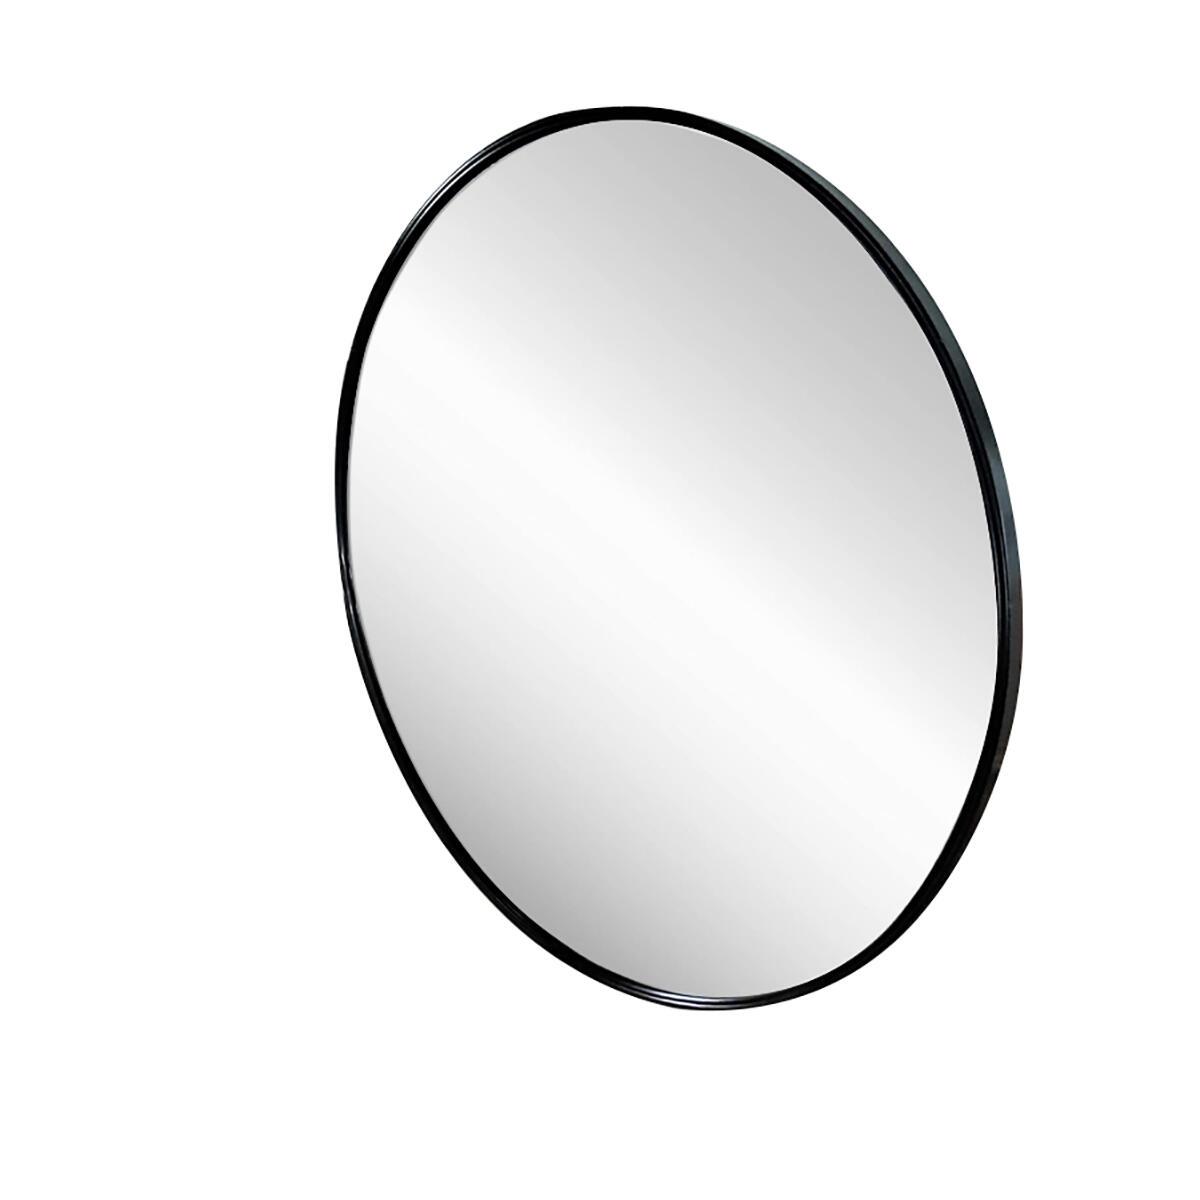 Hendson Black Round Wall Mirror - 27.5 Inch Large Circle Mirror, Circular Mirror for Bathroom, Entry, Dining Room, Living Room - Rustic Farmhouse Decor Metal Vanity Circle Mirror